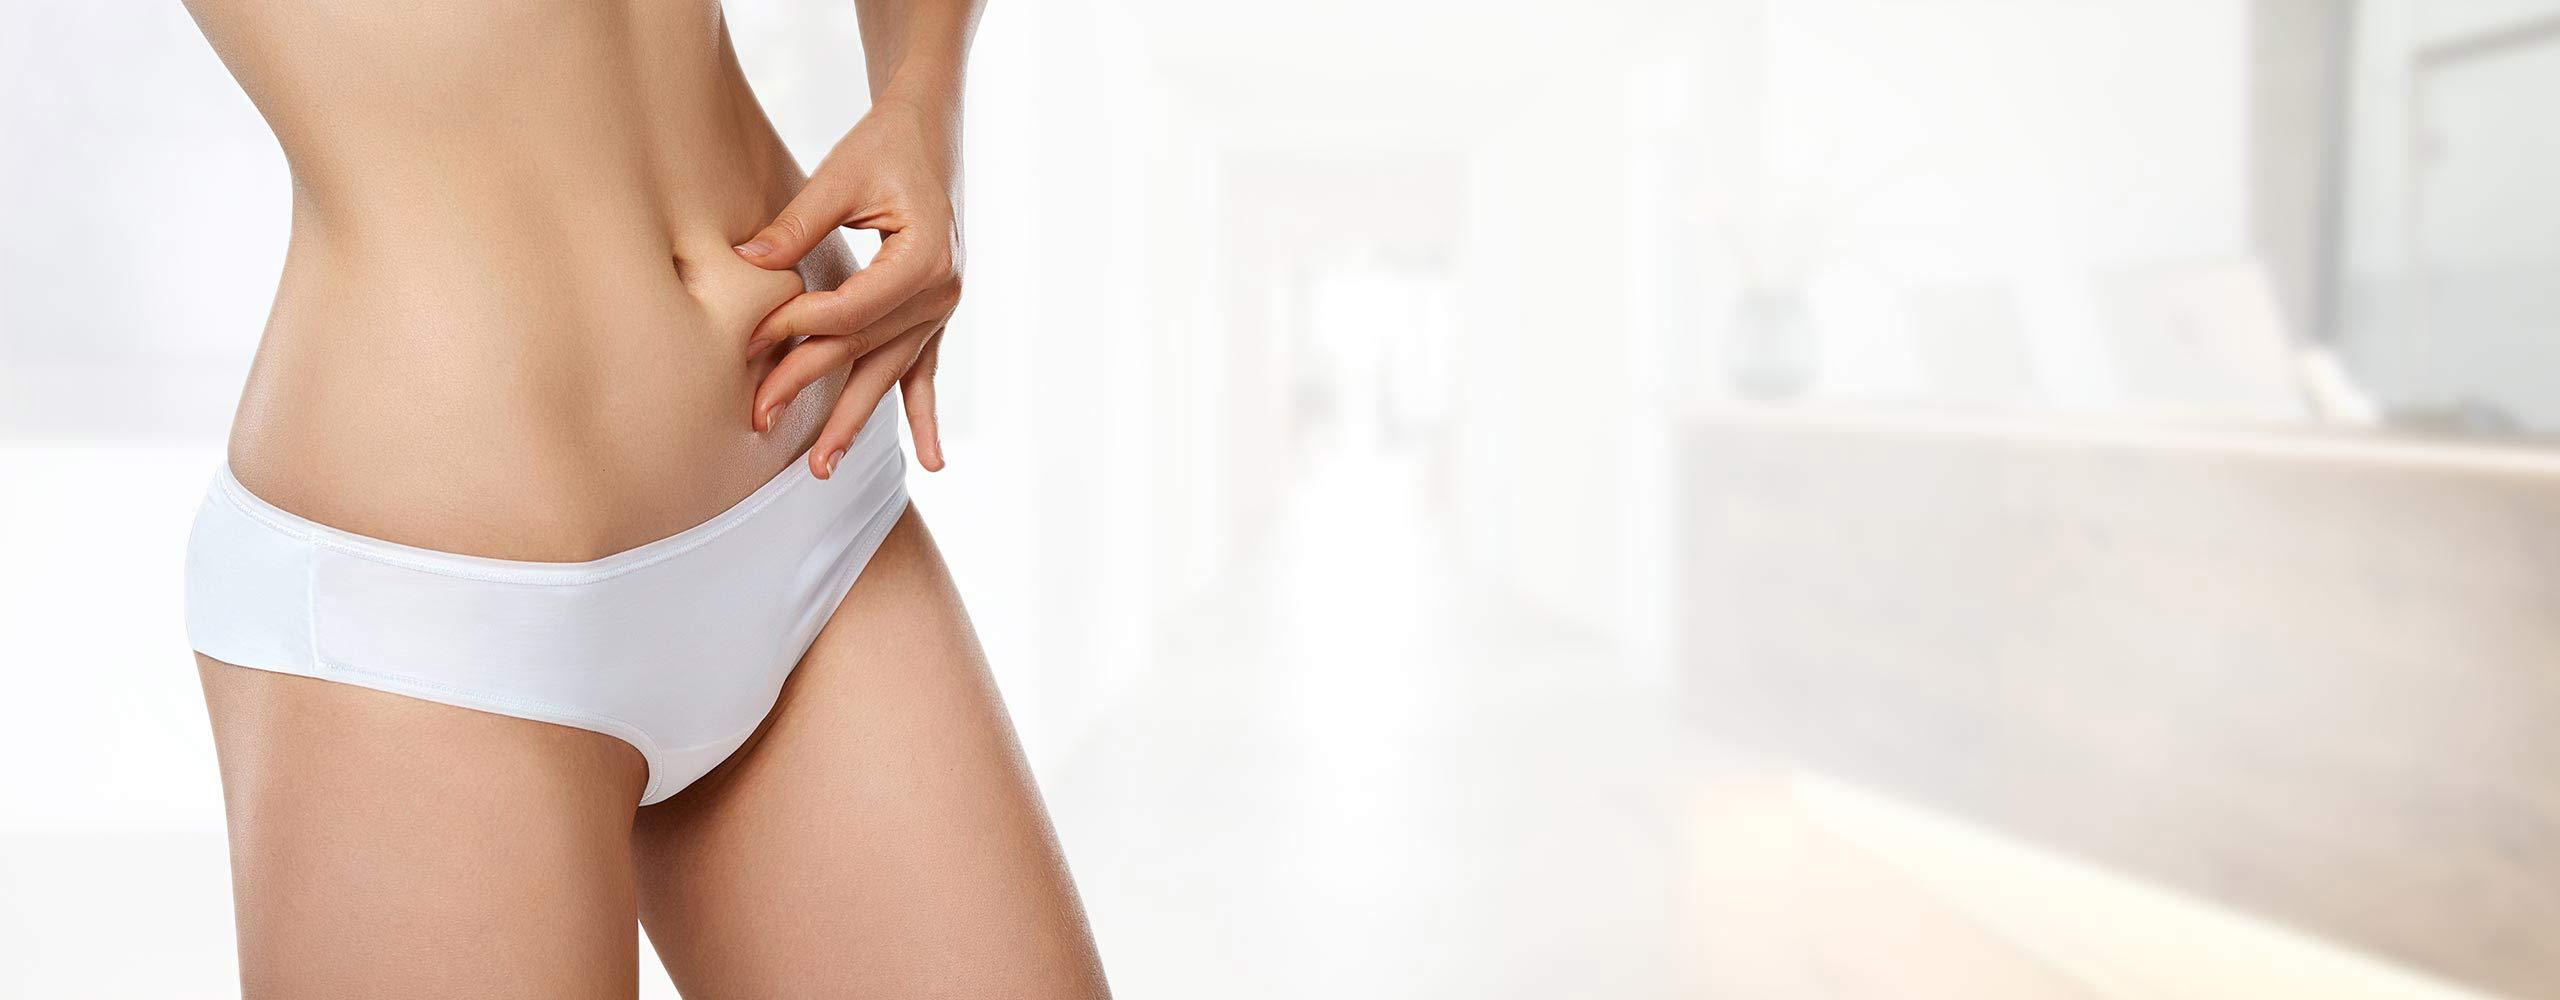 fettabsaugung liposuktion schoenheitsklinik proaesthetic header